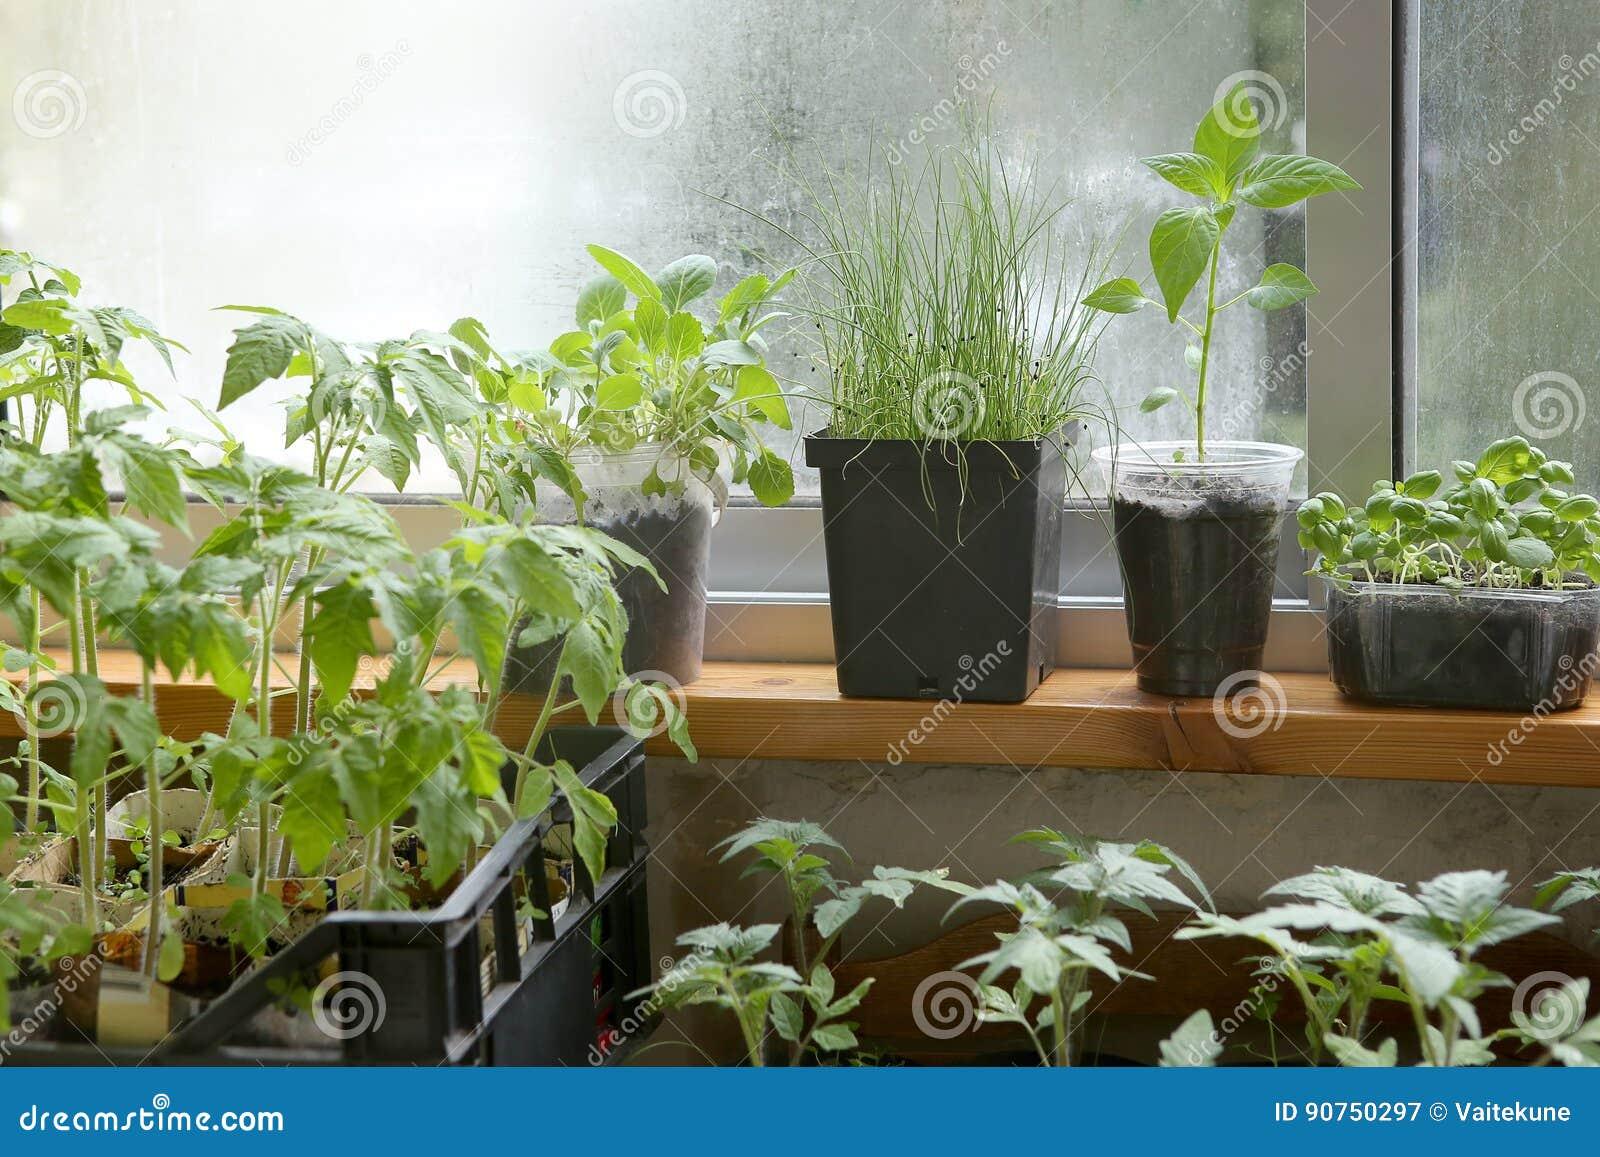 Spring seedlings: tomatoes, pepper, cabbages, basil and leeks. Vegetable seedlings in pots on windowsill.